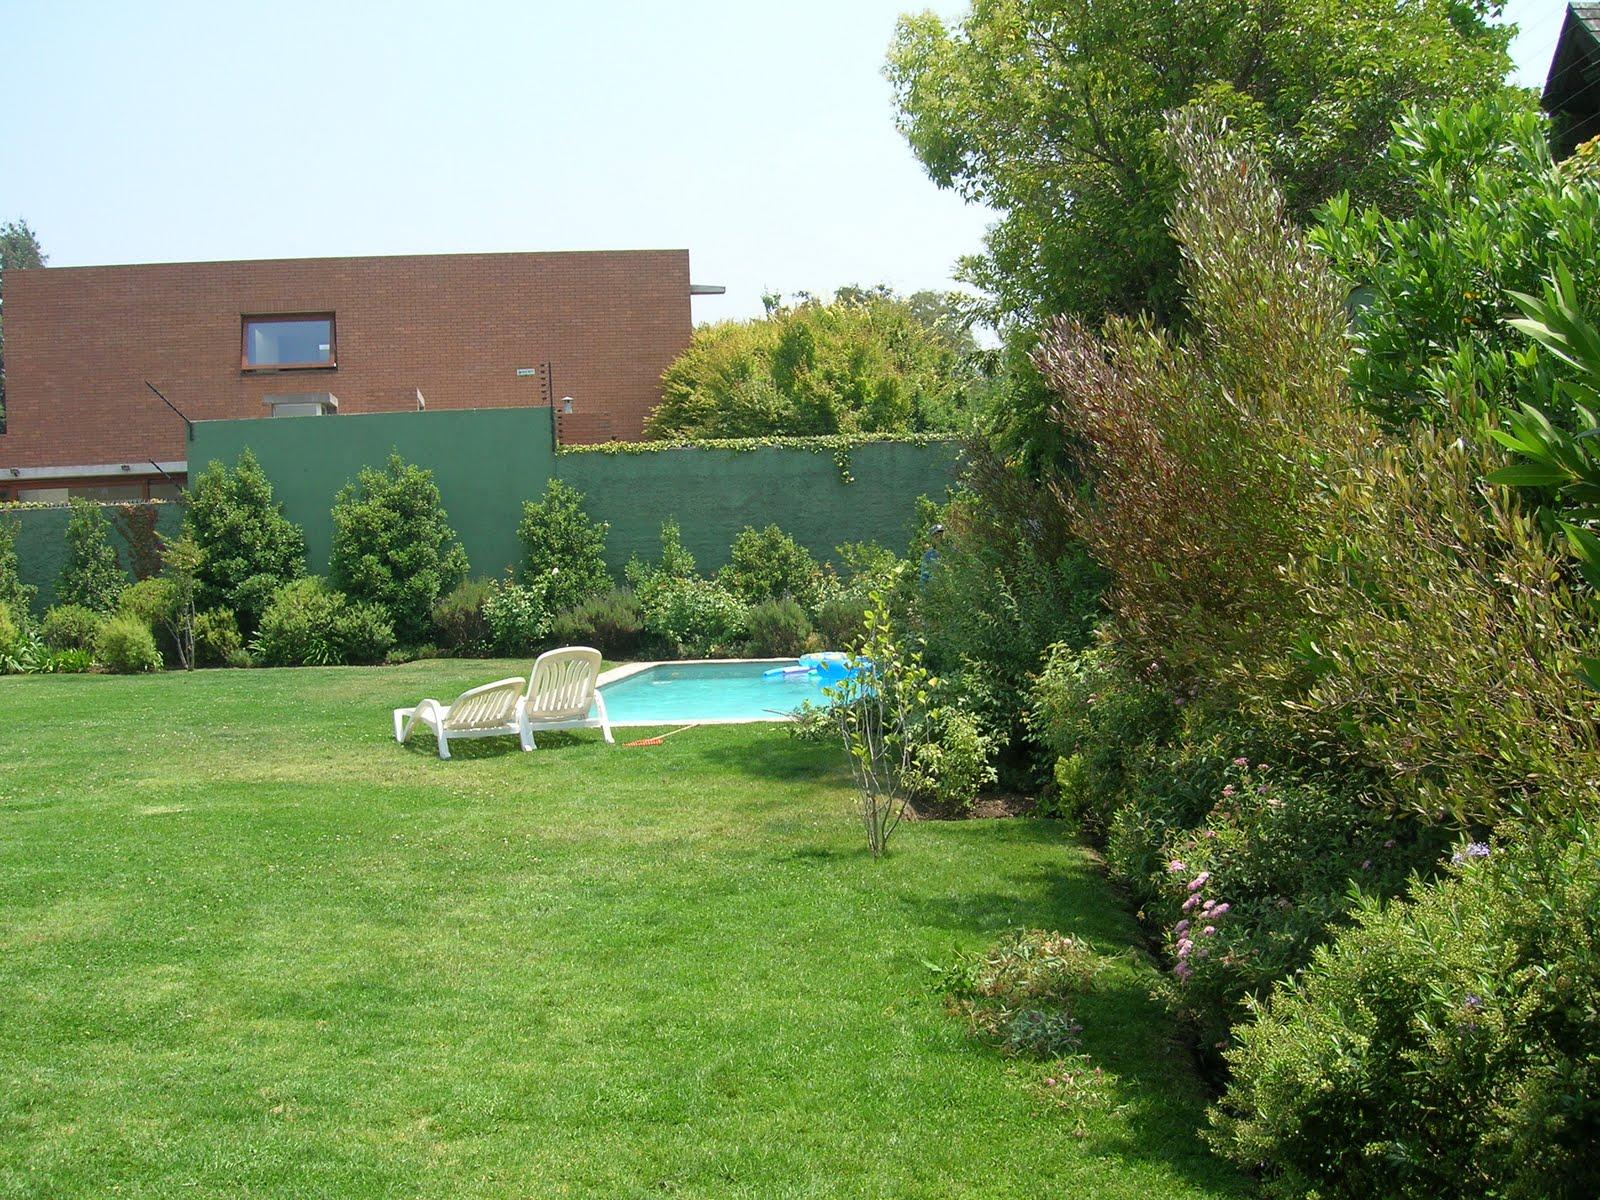 Darrigrandi y simunovic jardineria darrigrandi y for Jardineros a domicilio